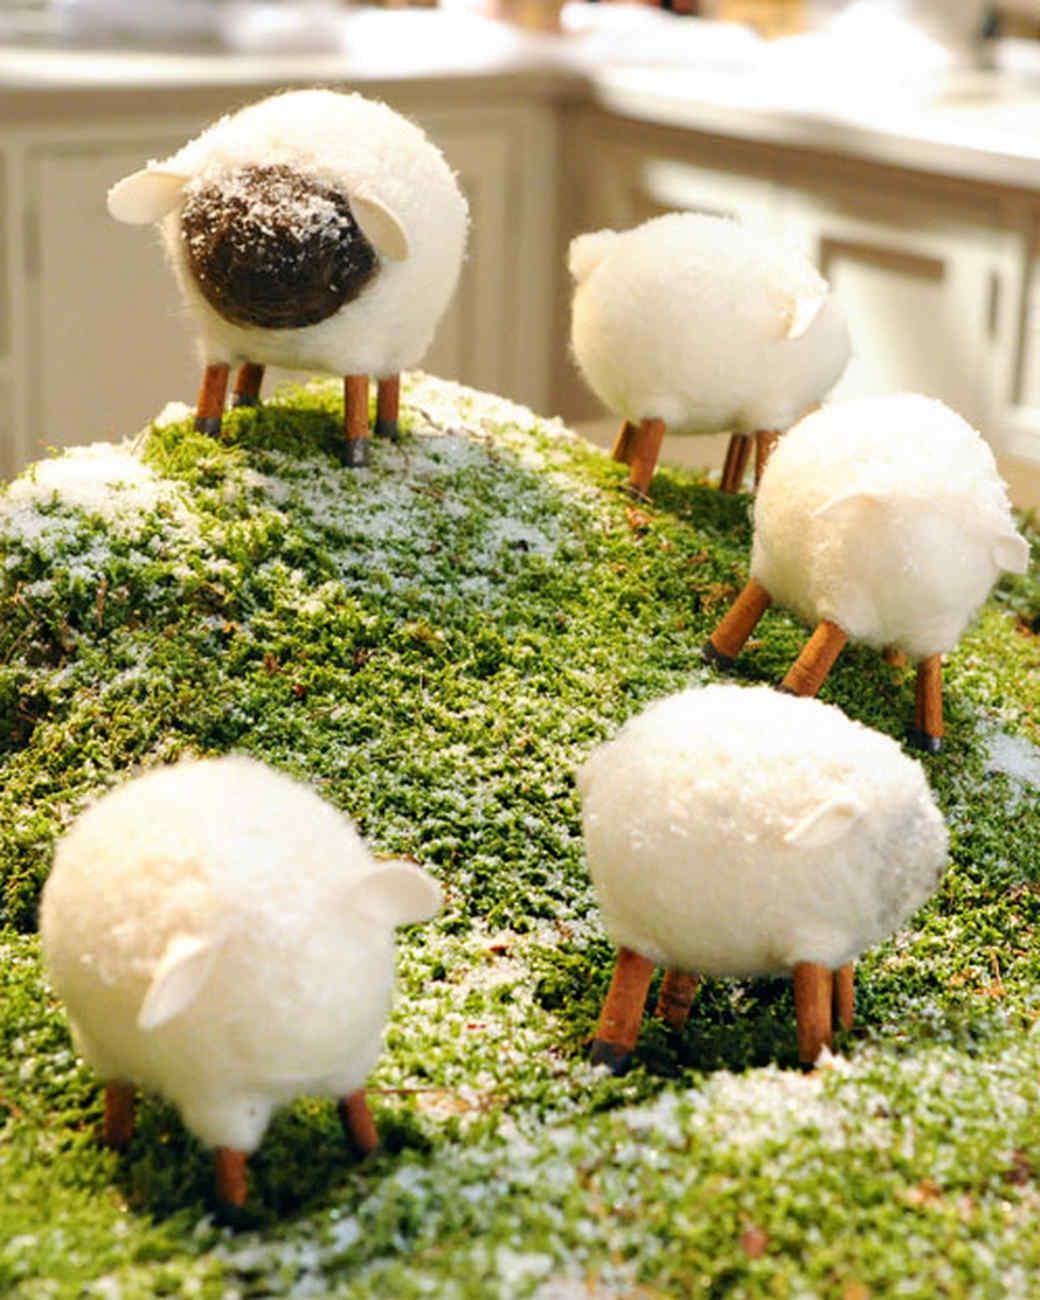 6057_120110_felted_sheep.jpg